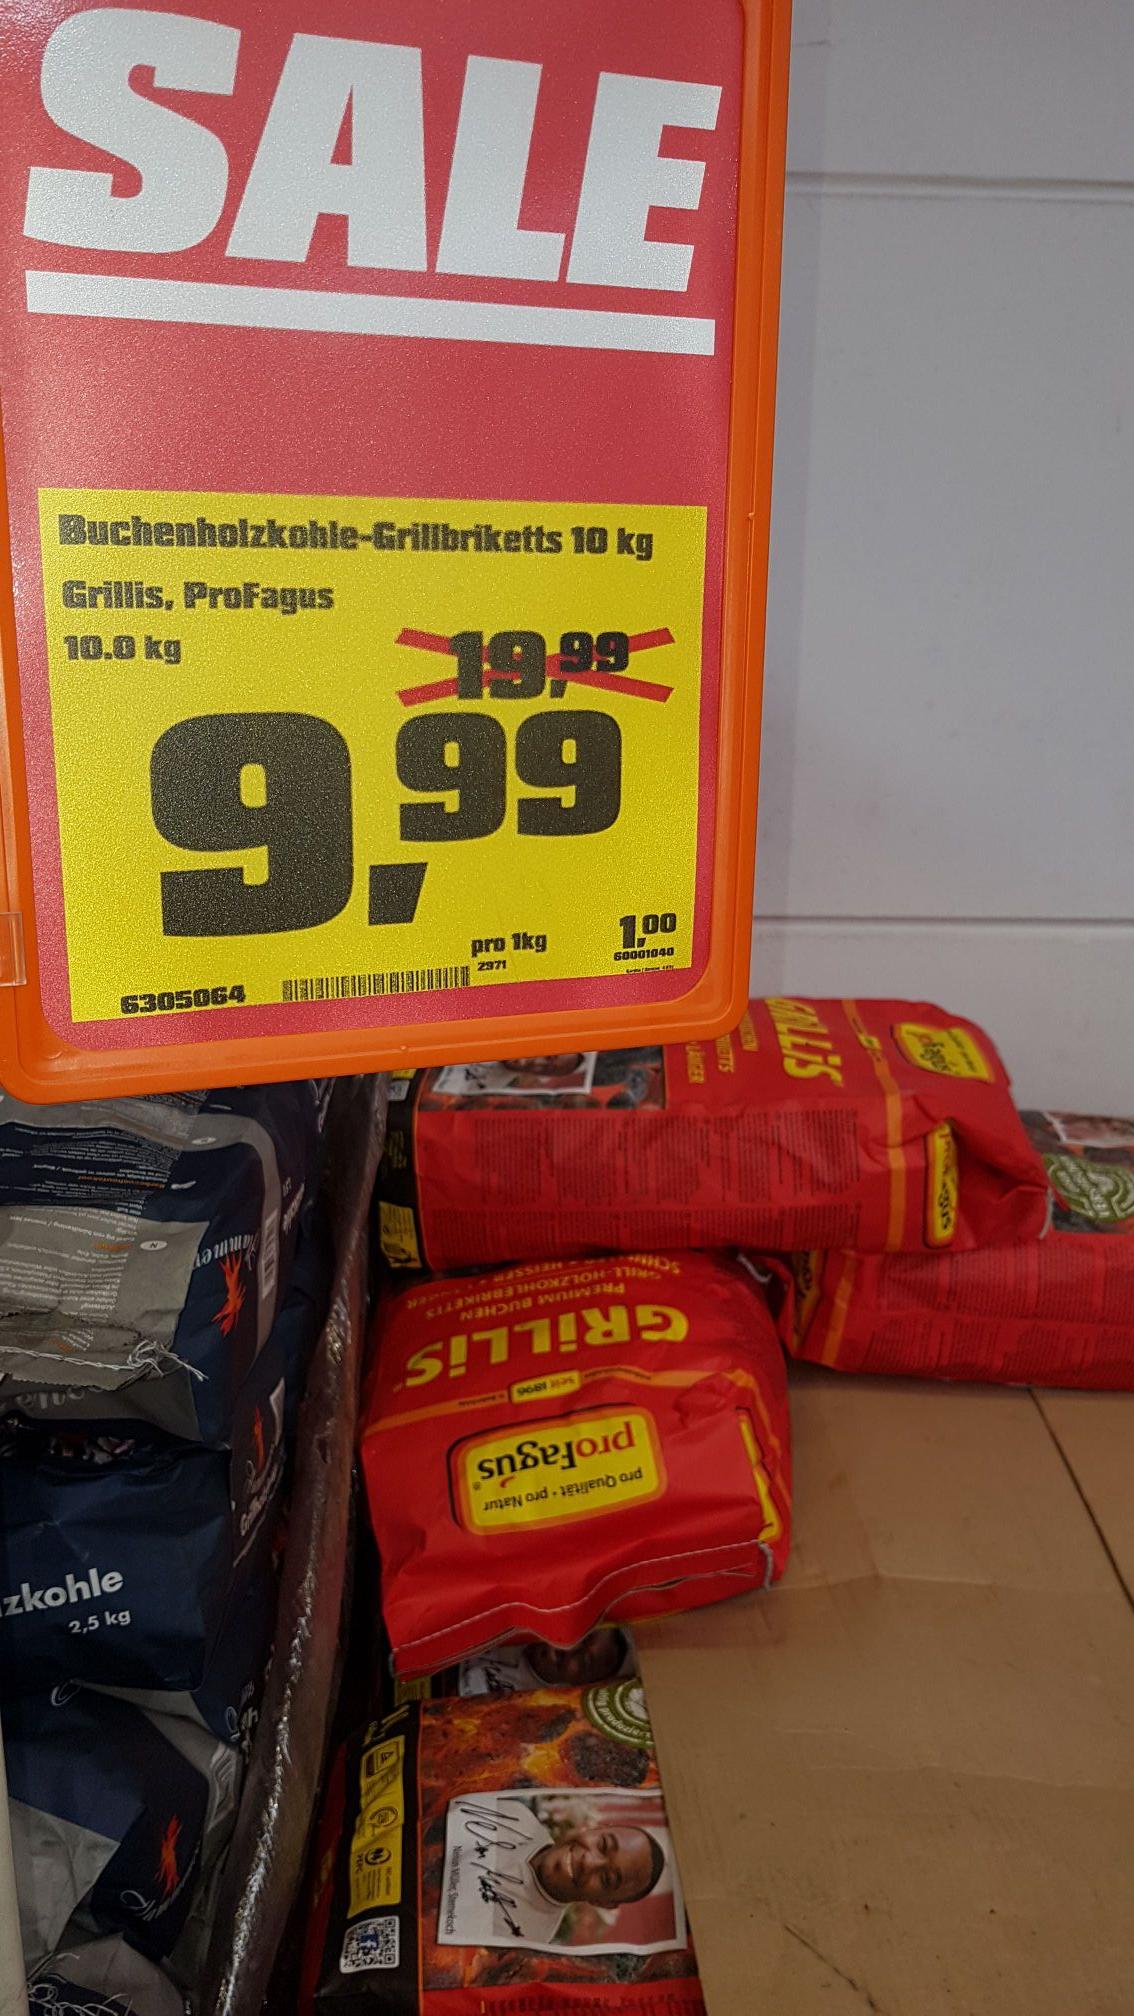 (Lokal) OBI Weinheim ProFagus Holzkohlebriketts 10kg